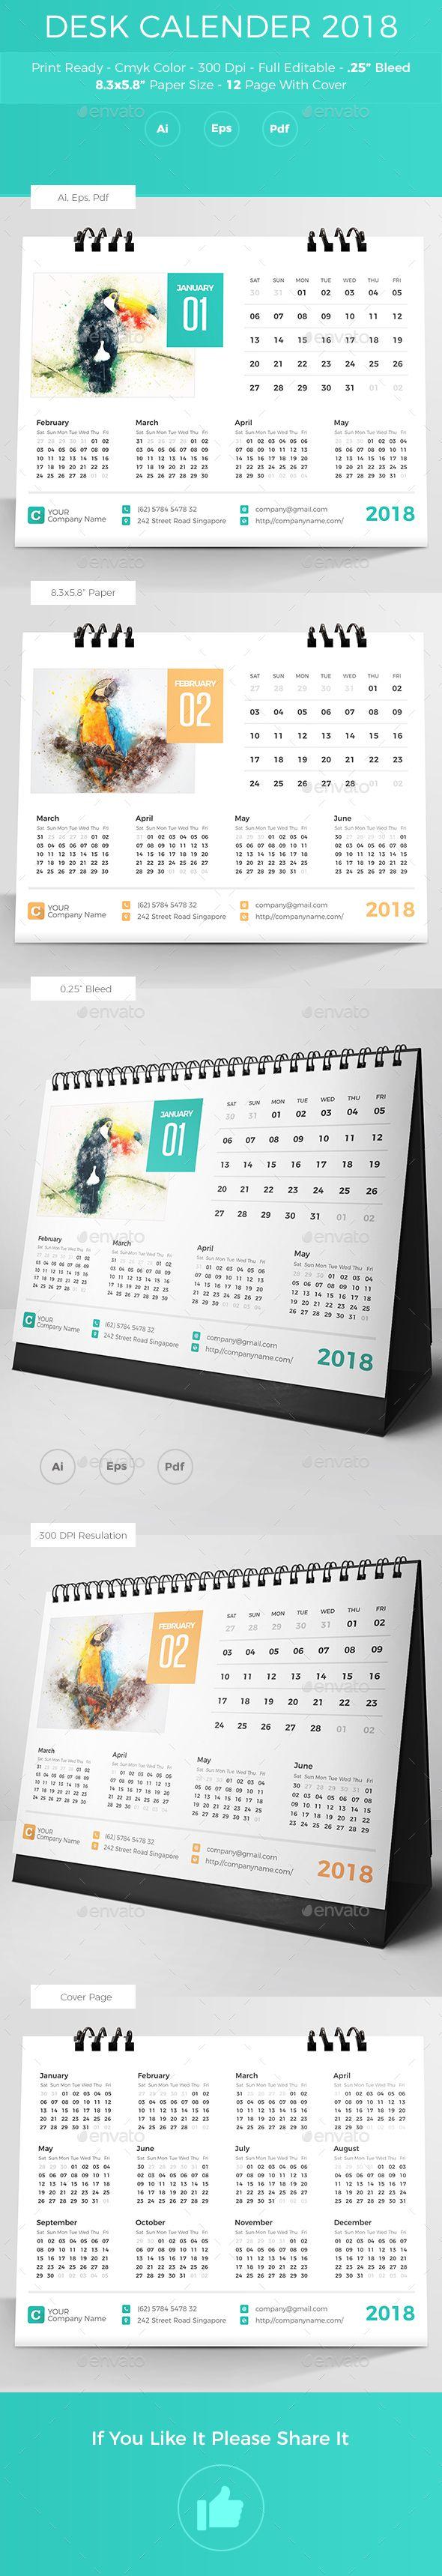 #Desk Calender 2018 - #Calendars Stationery